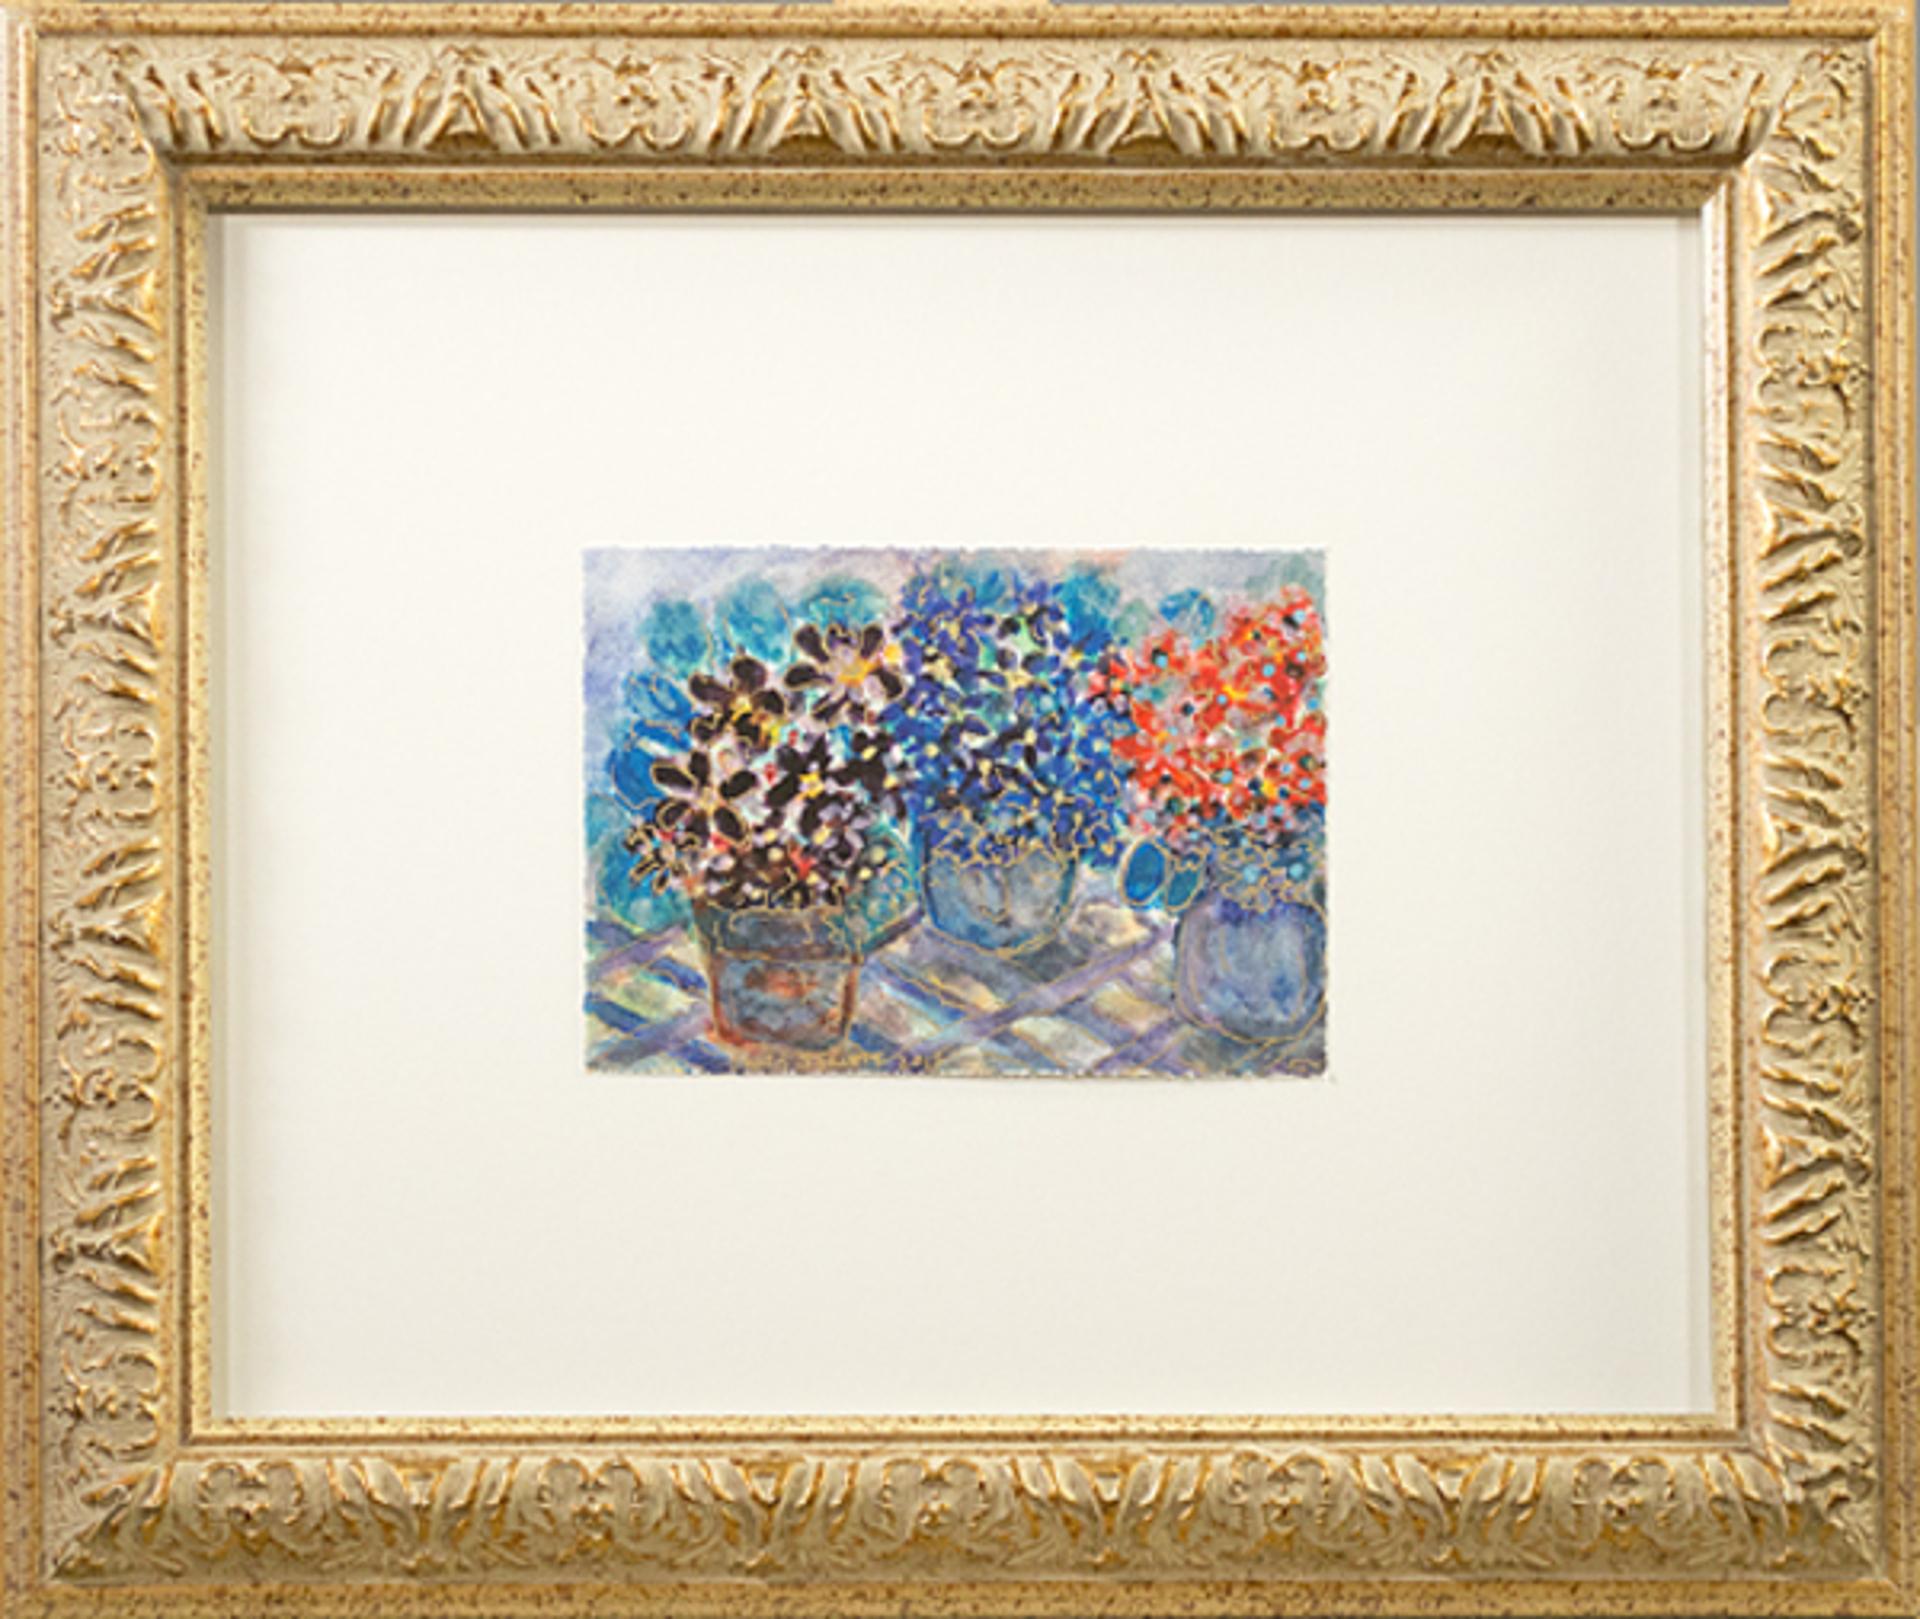 Triple Studio Golden African Violets by David Barnett